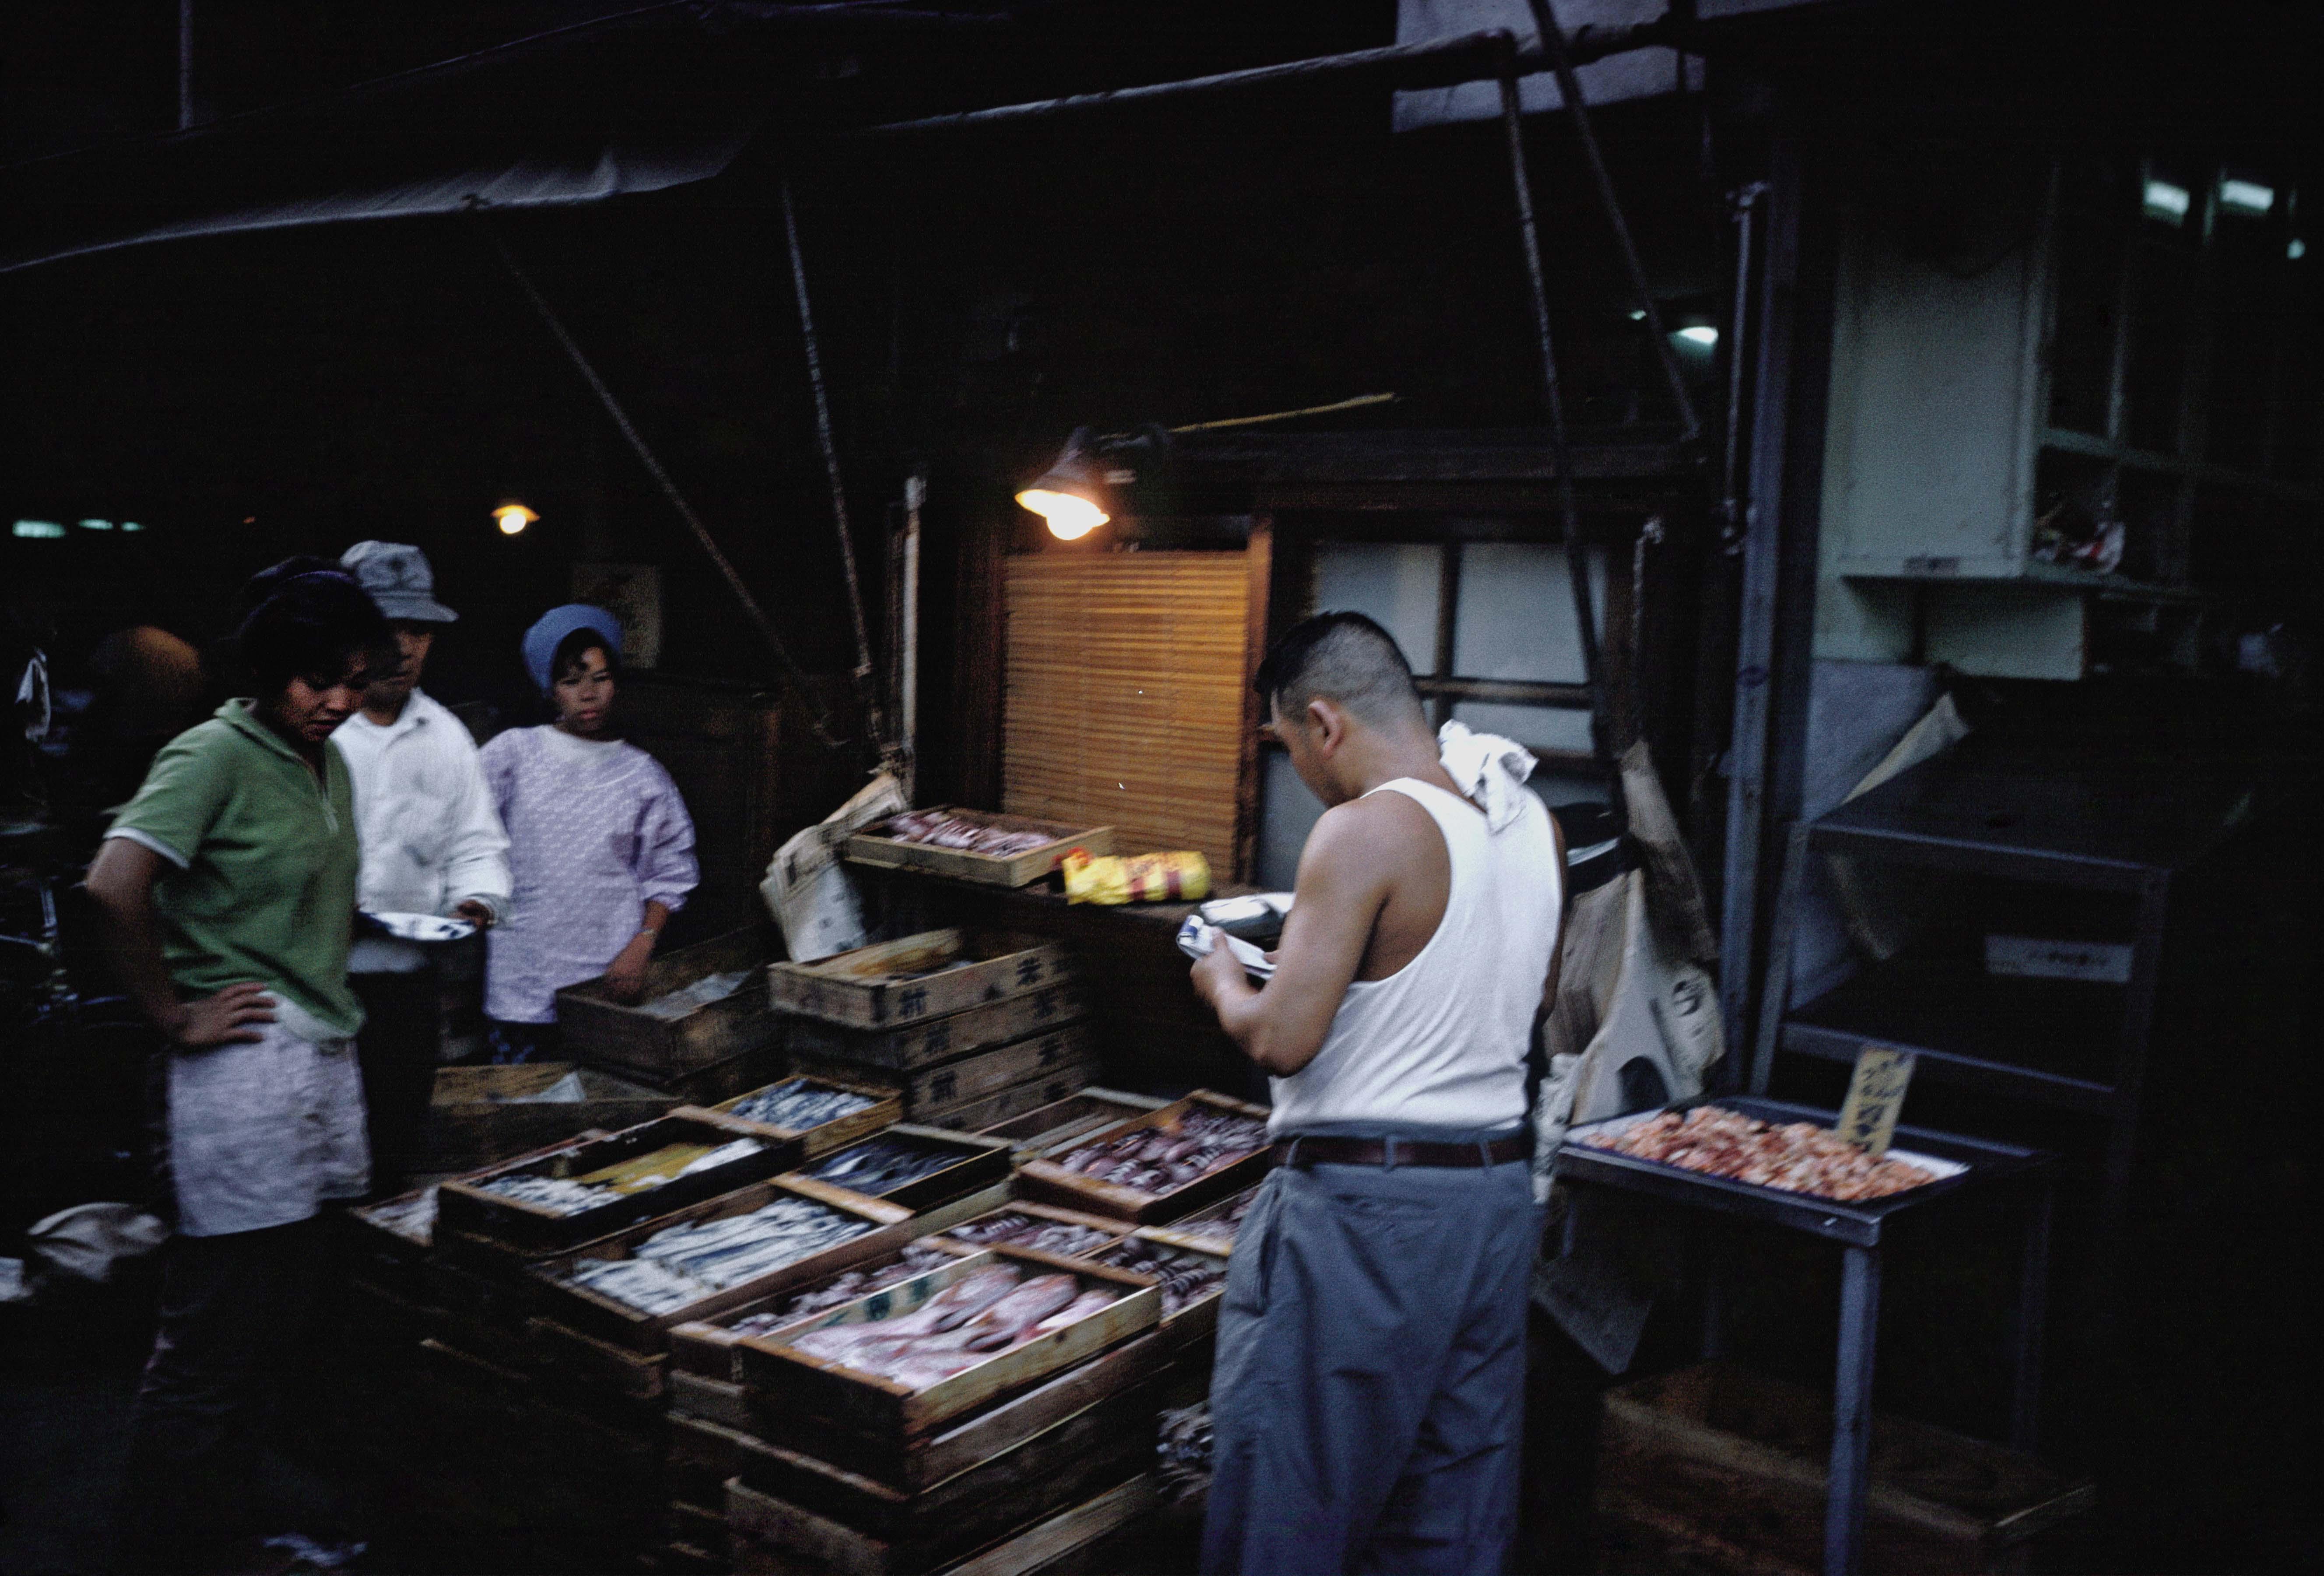 06-Tokyo, marché aux poissons, 1962  © Martin Karplus